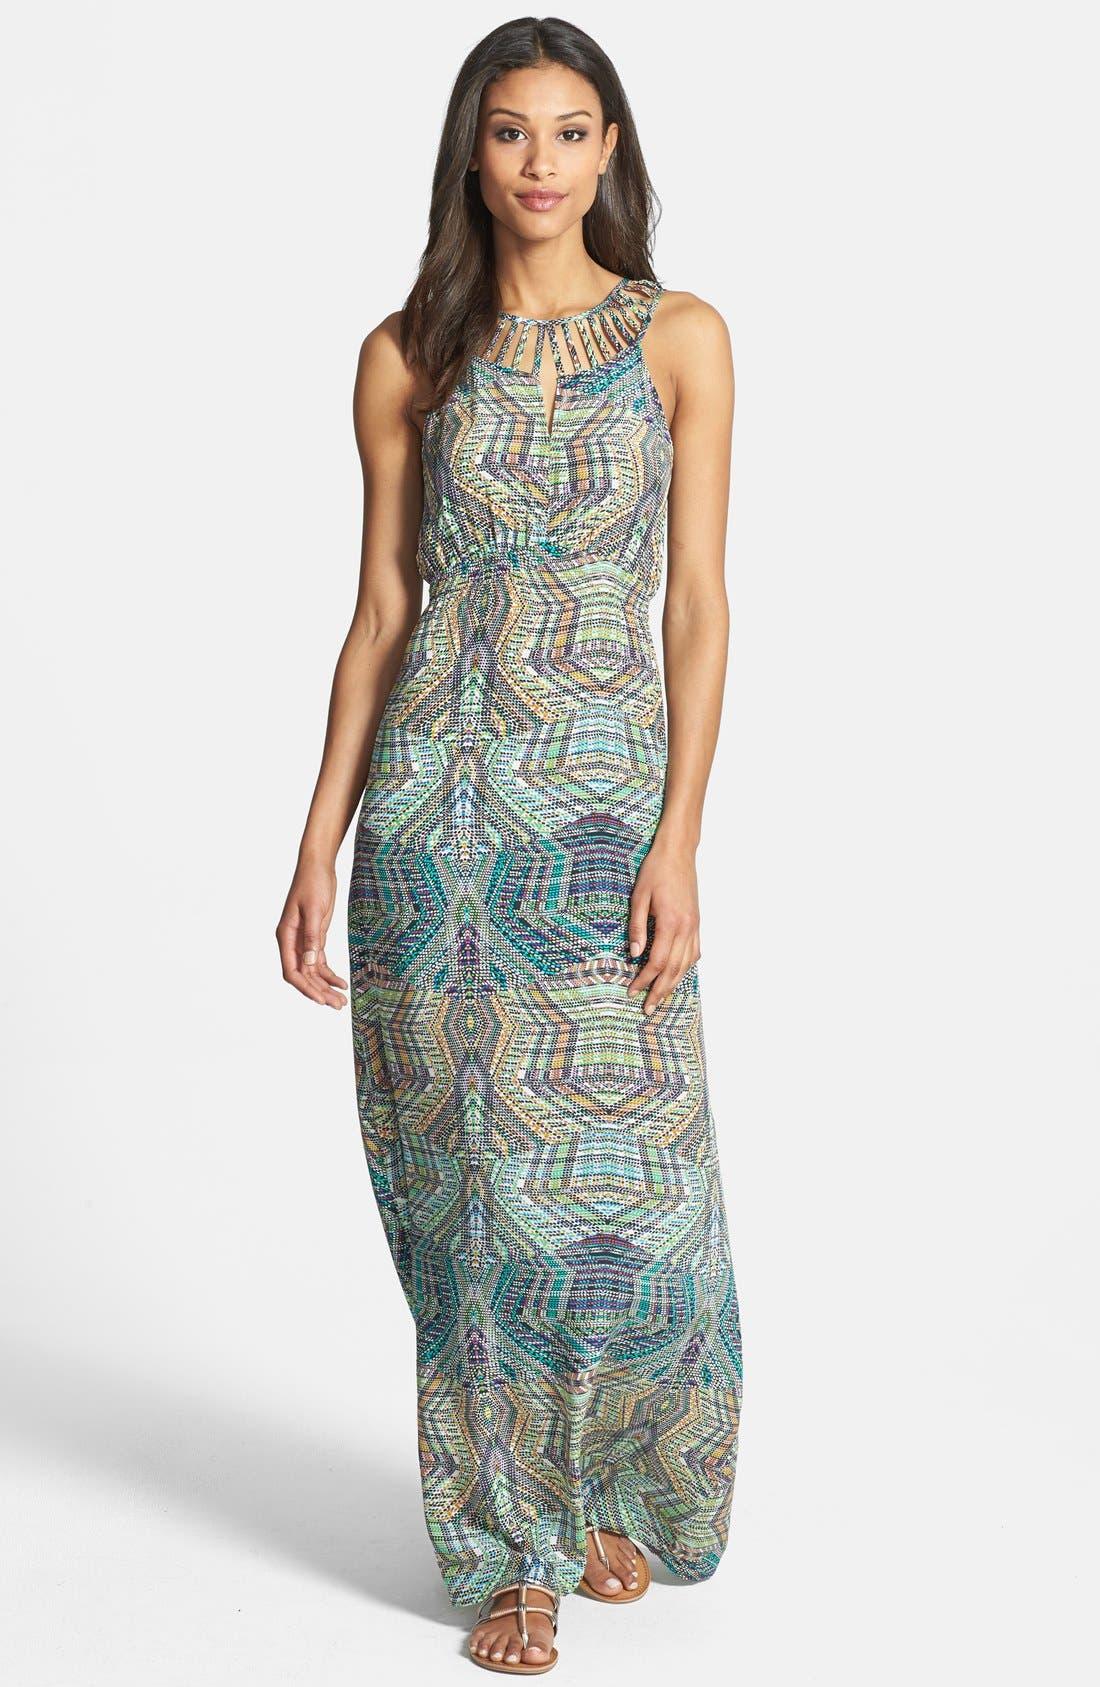 Alternate Image 1 Selected - Charlie Jade 'Jacy' Print Silk Crêpe de Chine Maxi Dress